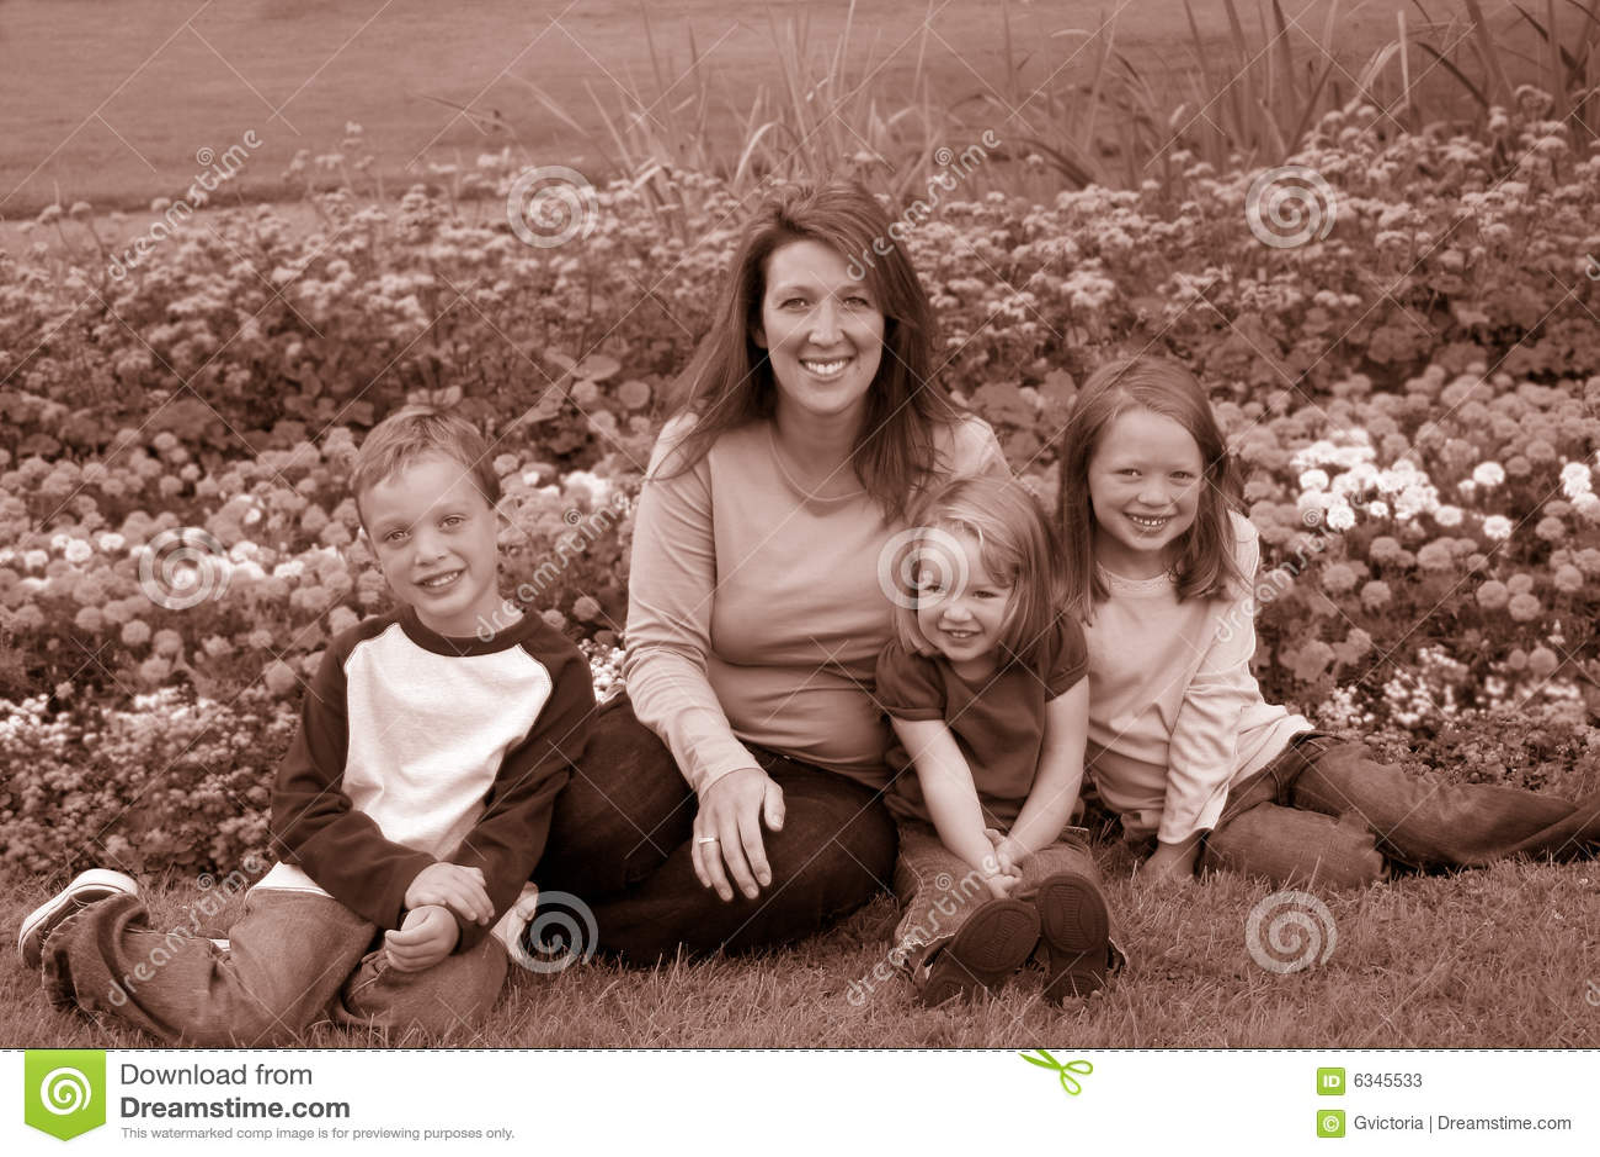 Single mom and kids